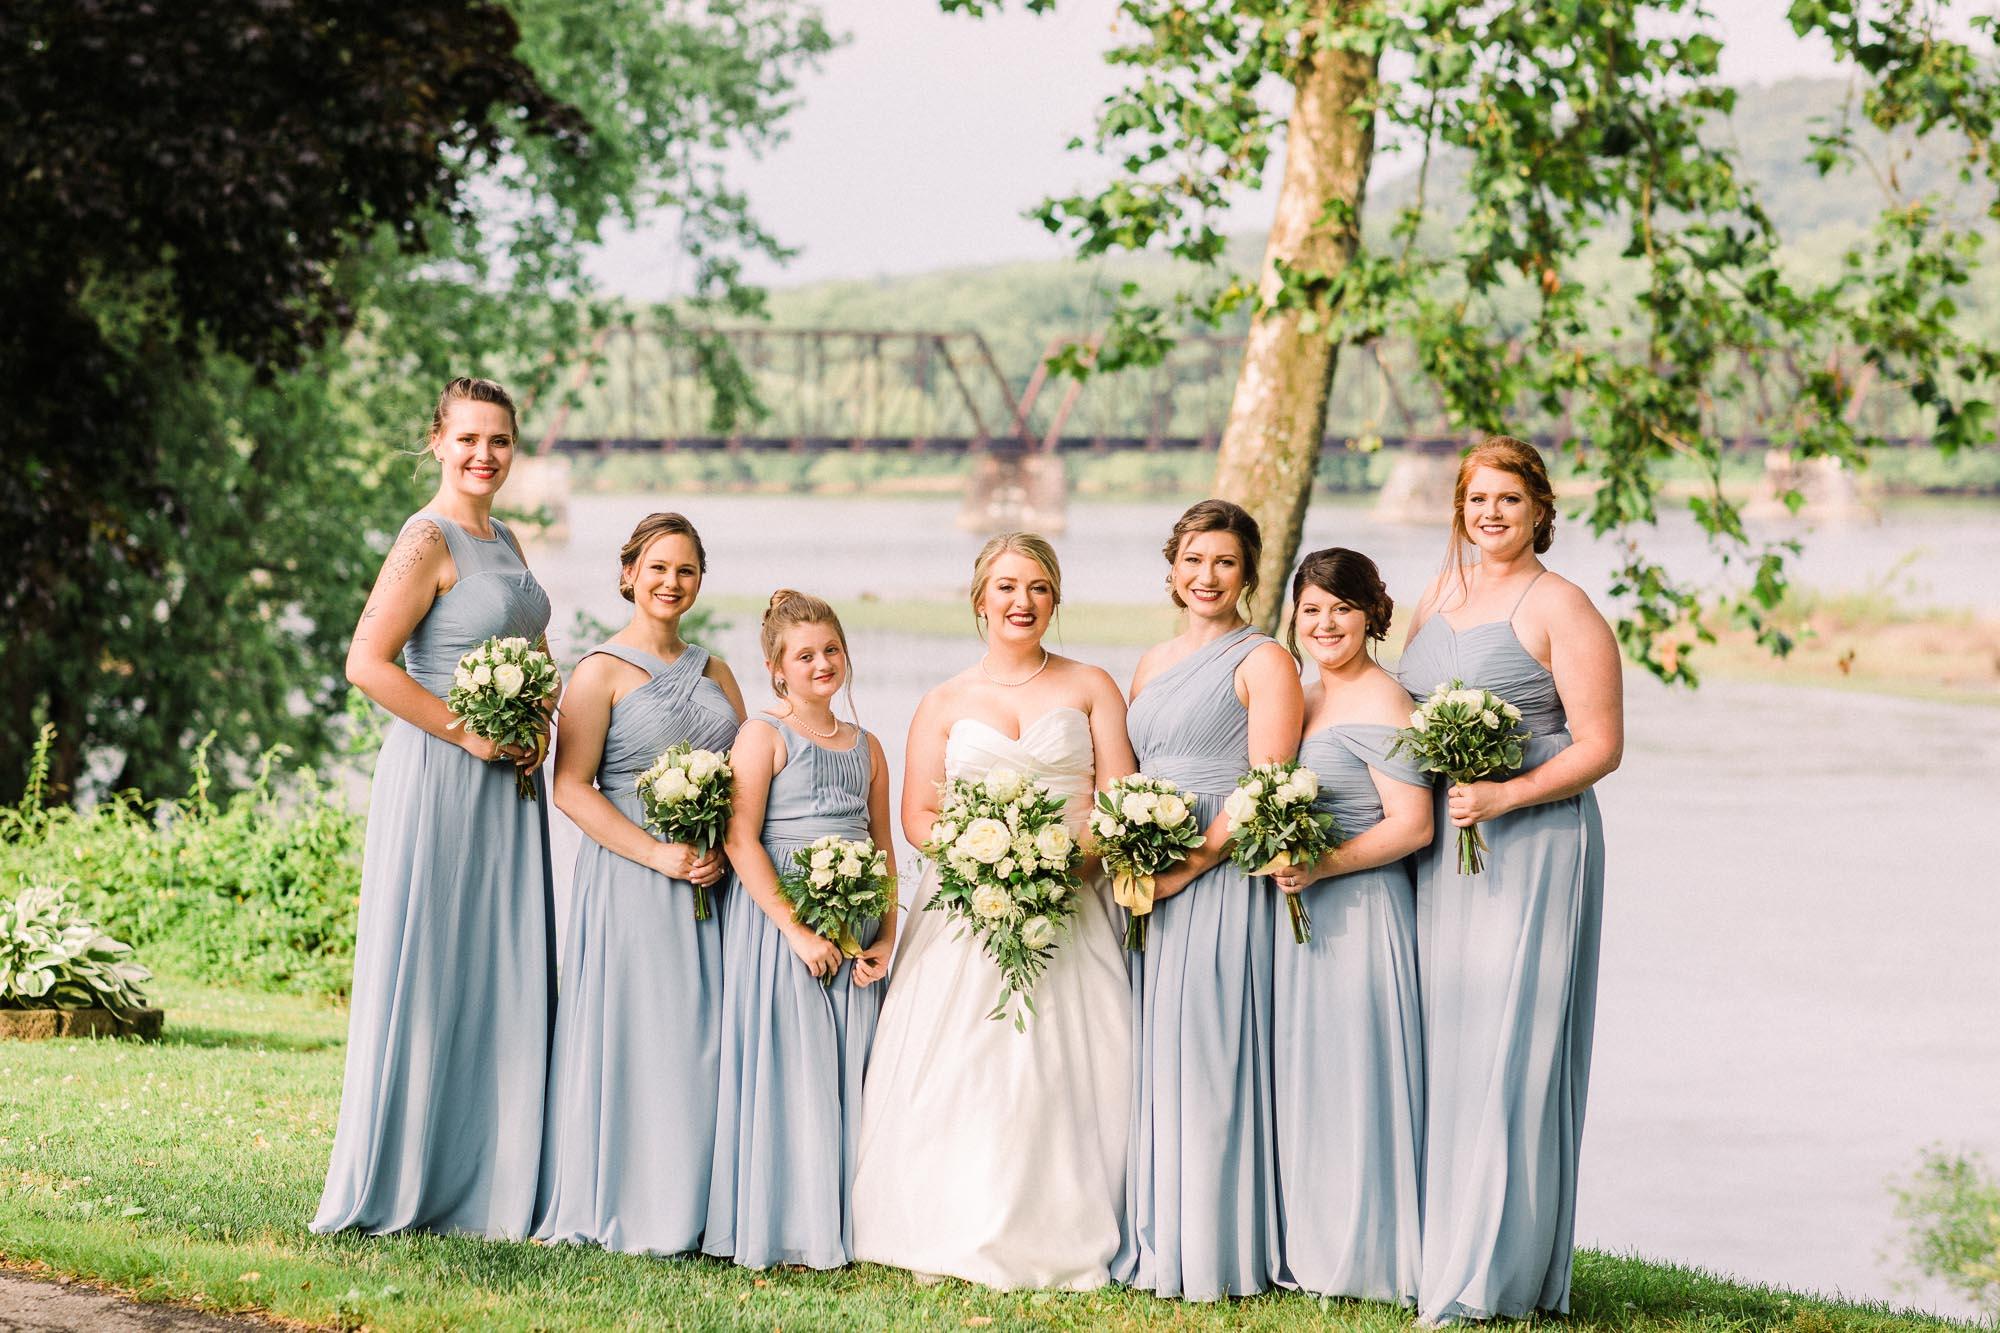 isle-of-que-wedding-4020.jpg